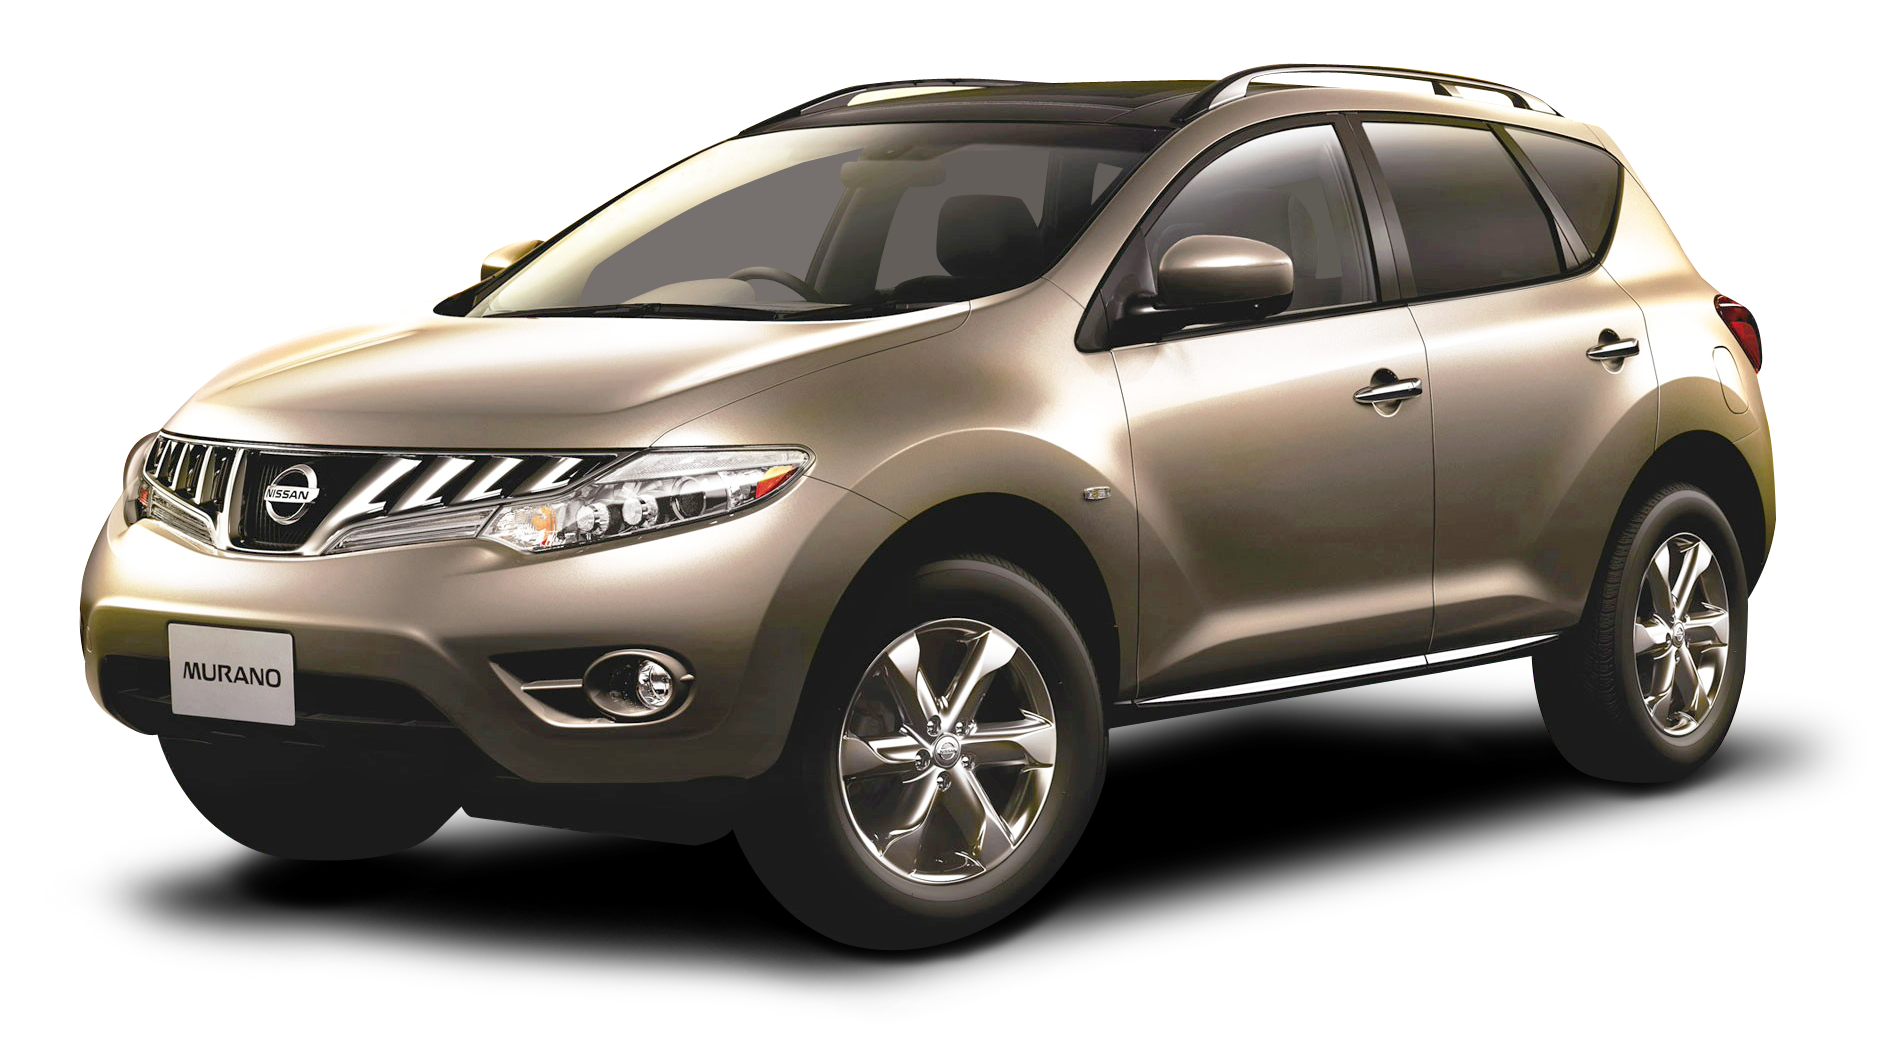 Nissan PNG Image Carros